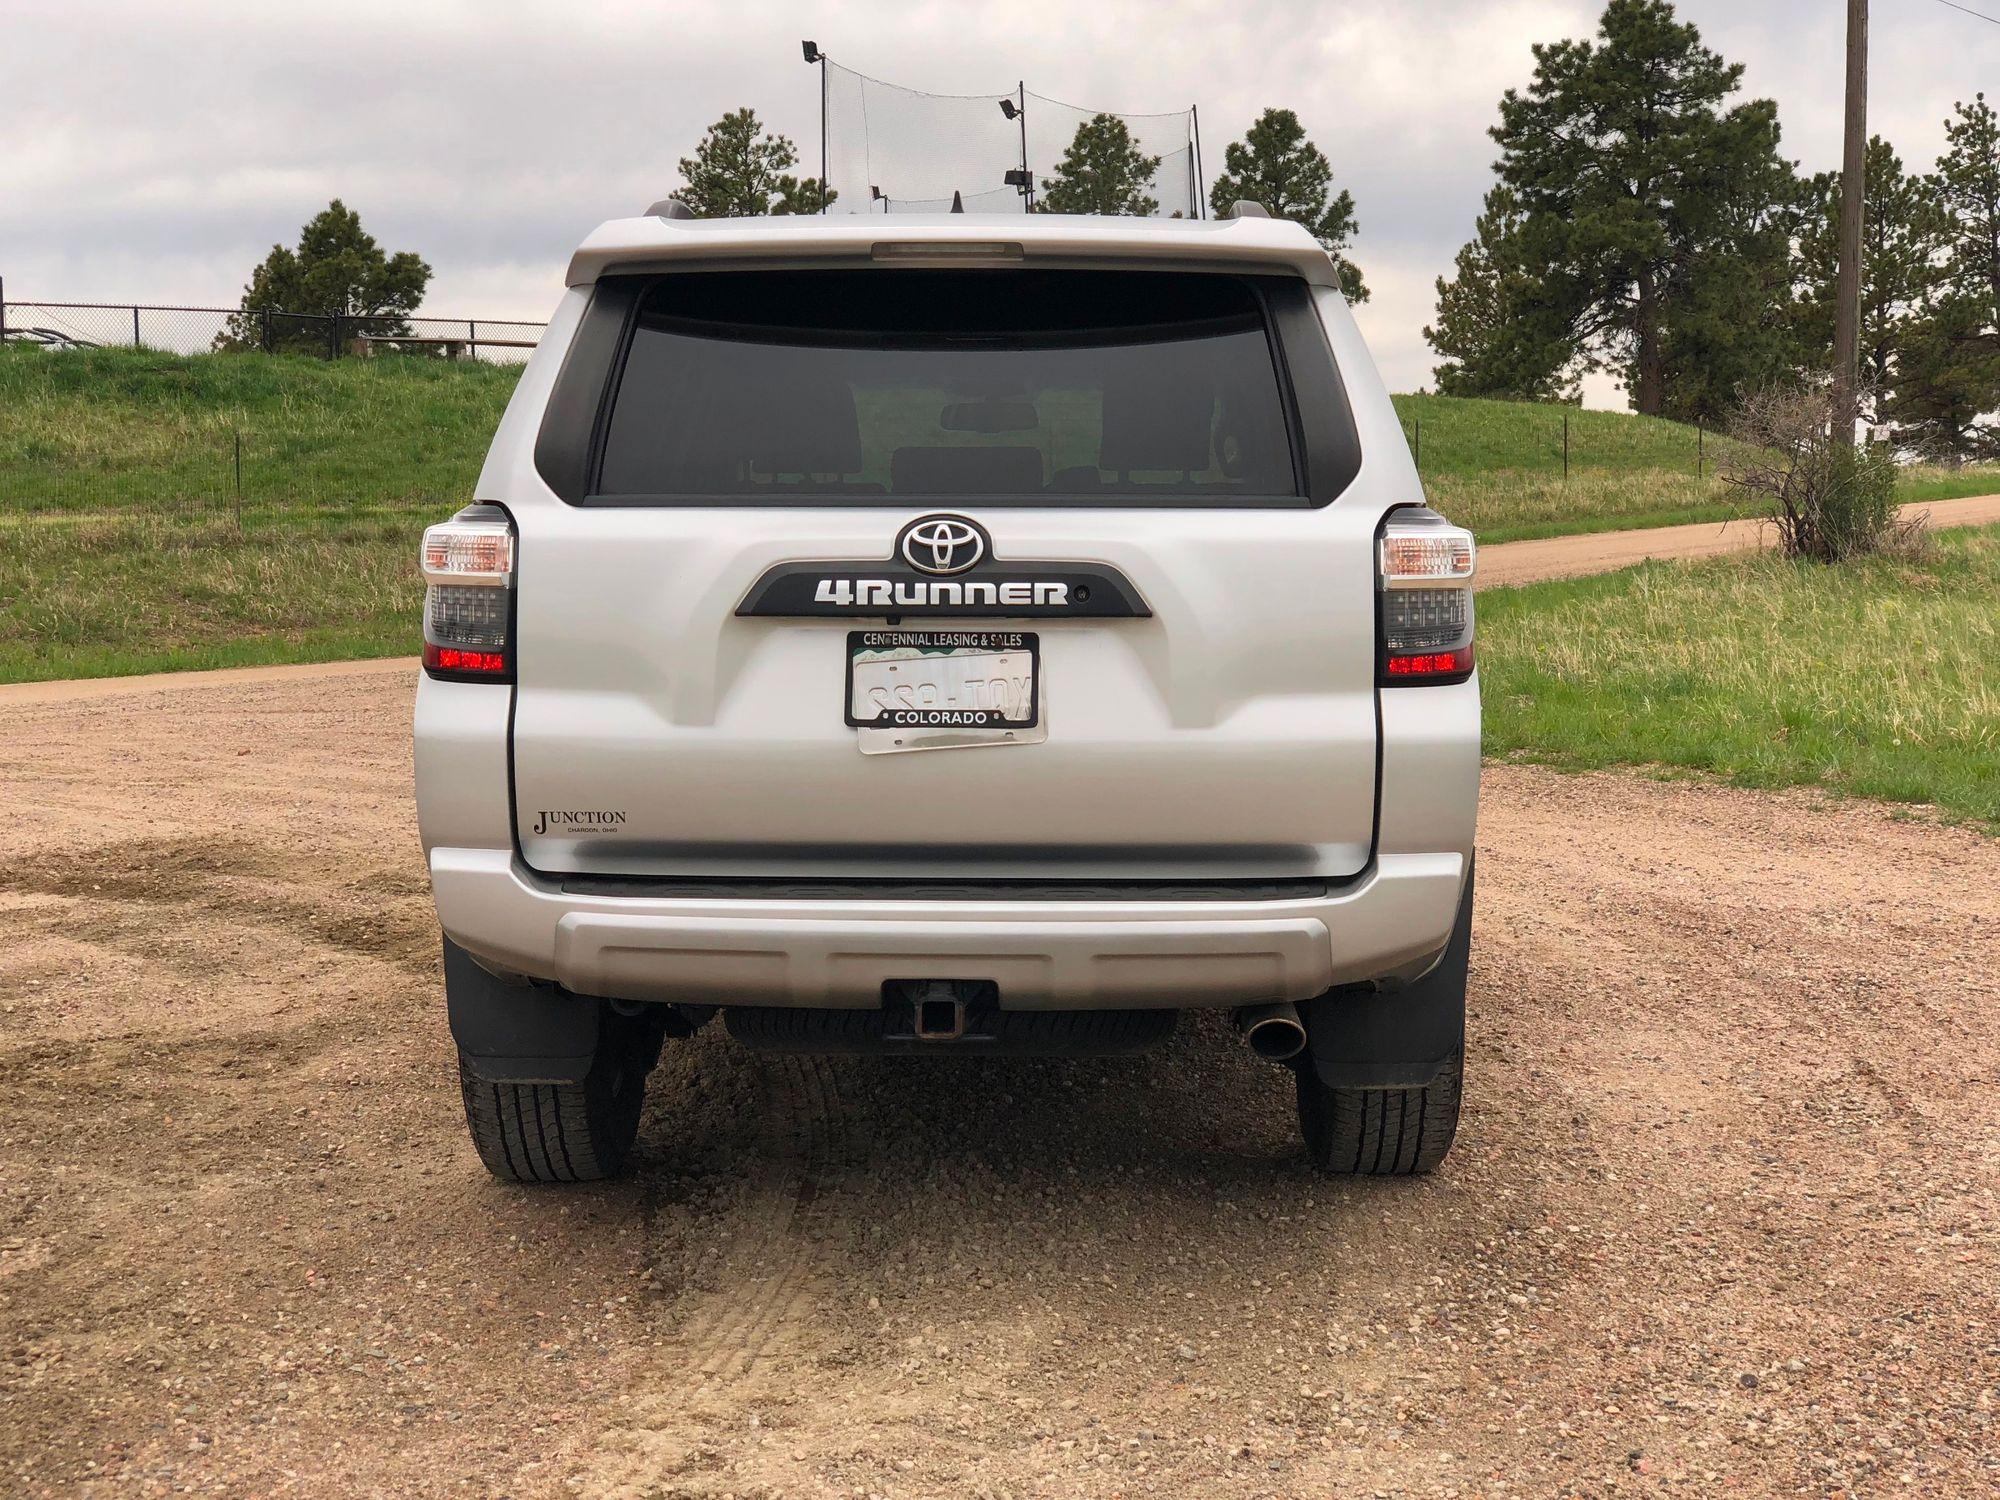 2014 Toyota 4Runner Trail Premium | CoolCarGuy com